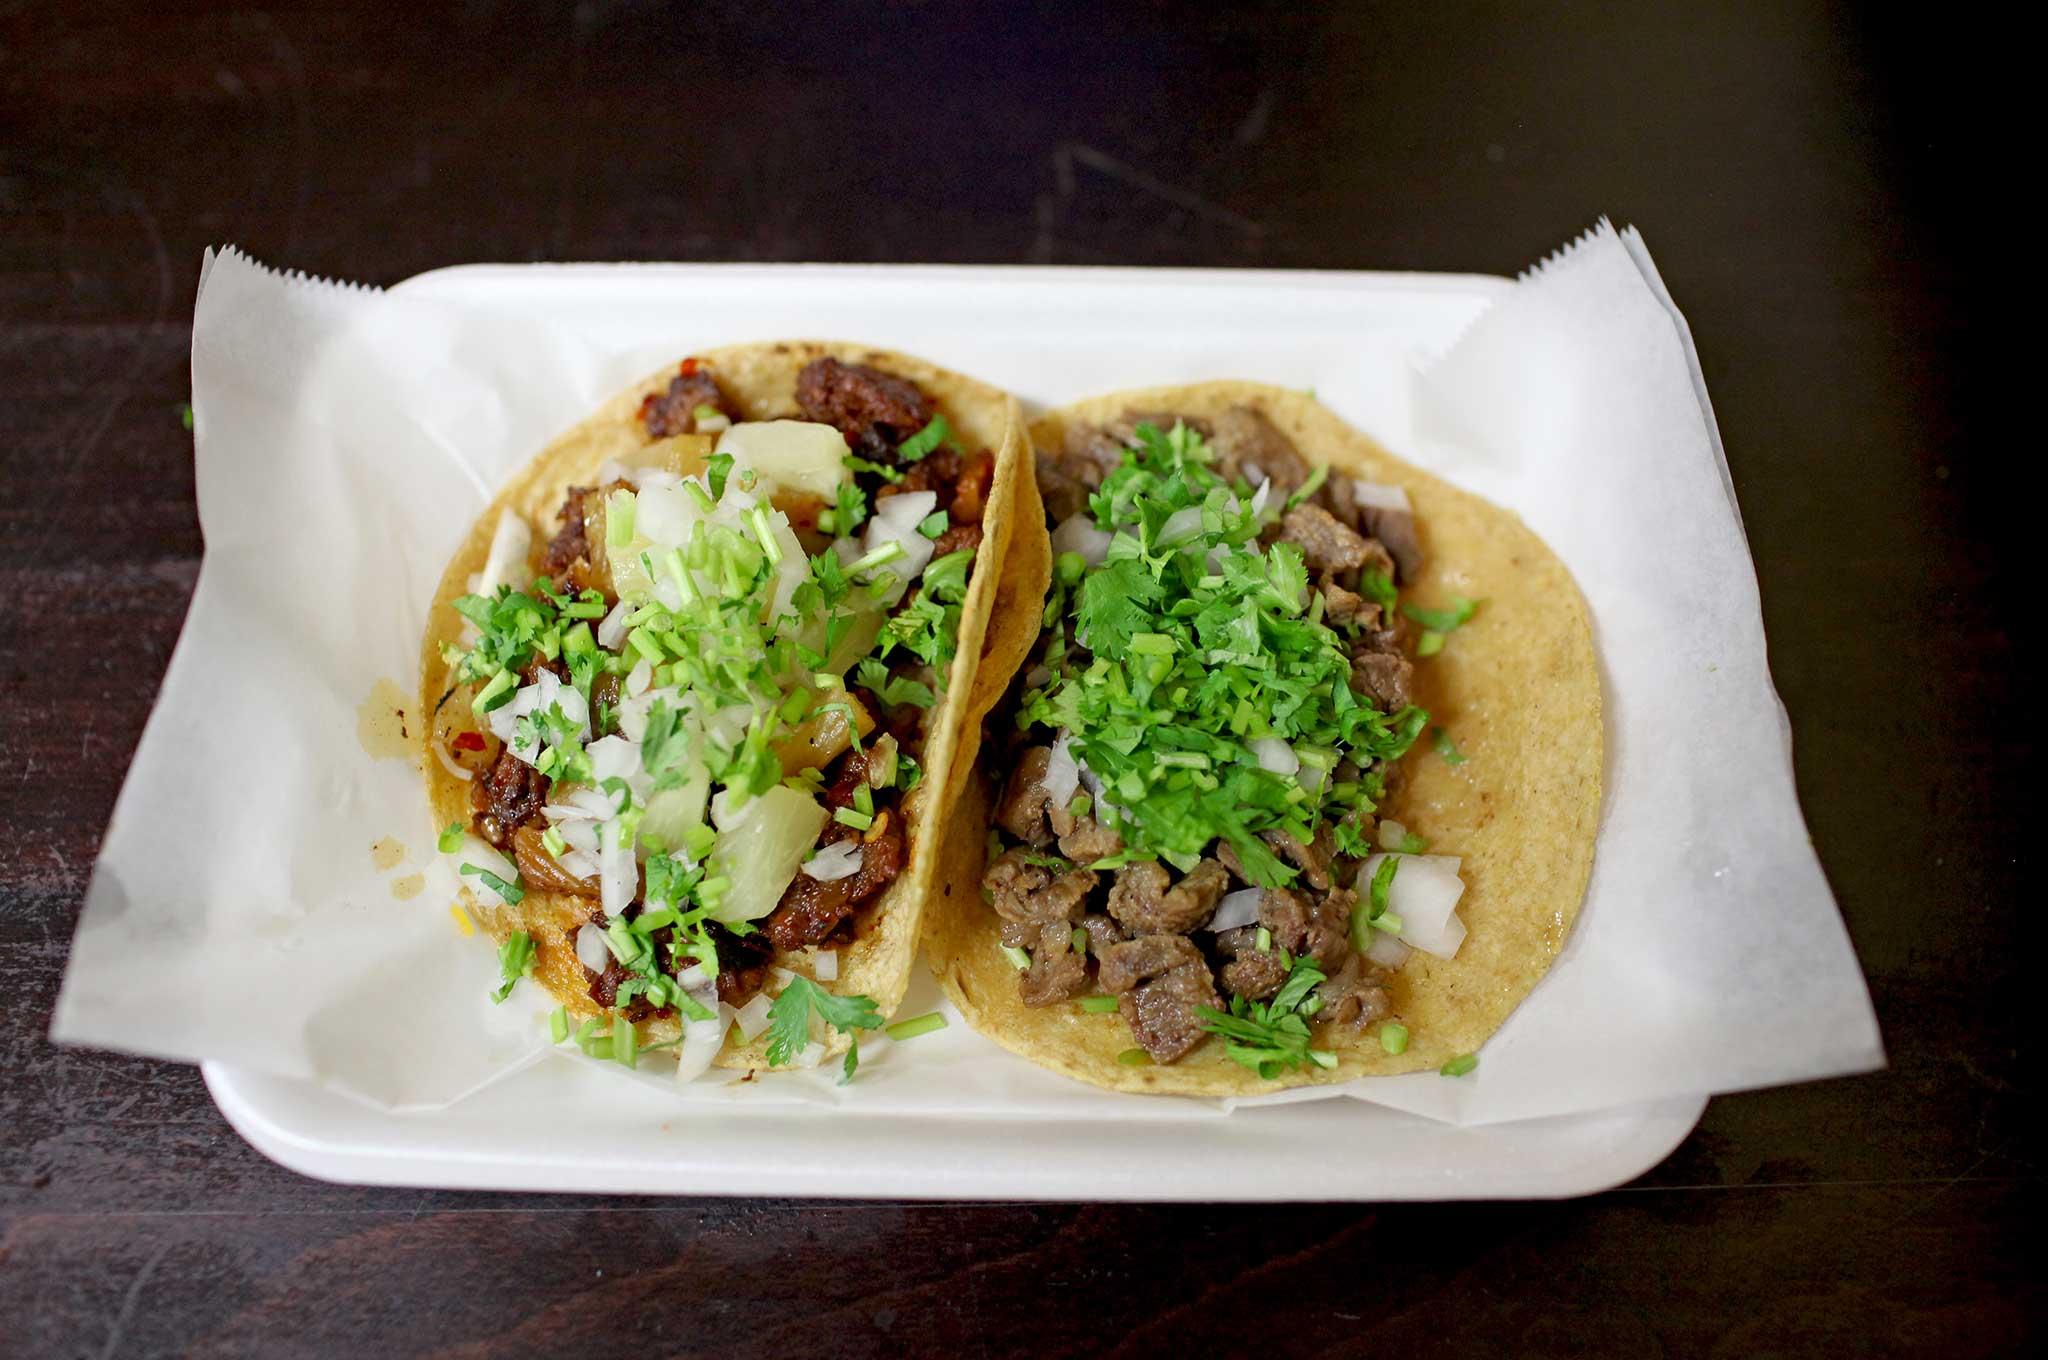 vip-tacos-pastor-asada-tacos